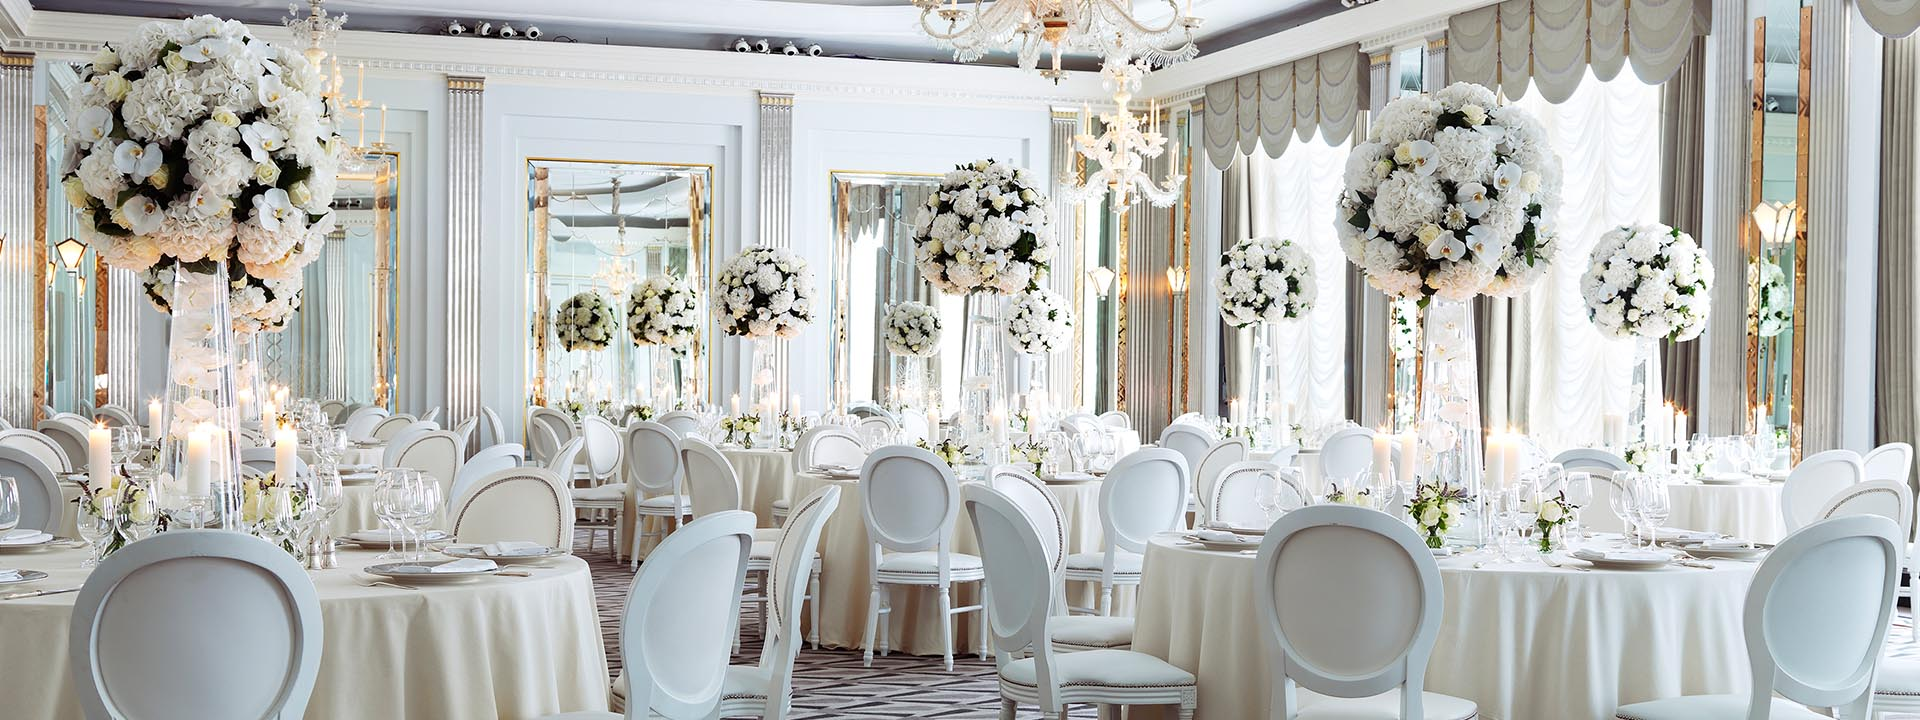 The Claridge's ballroom prepared for a wedding